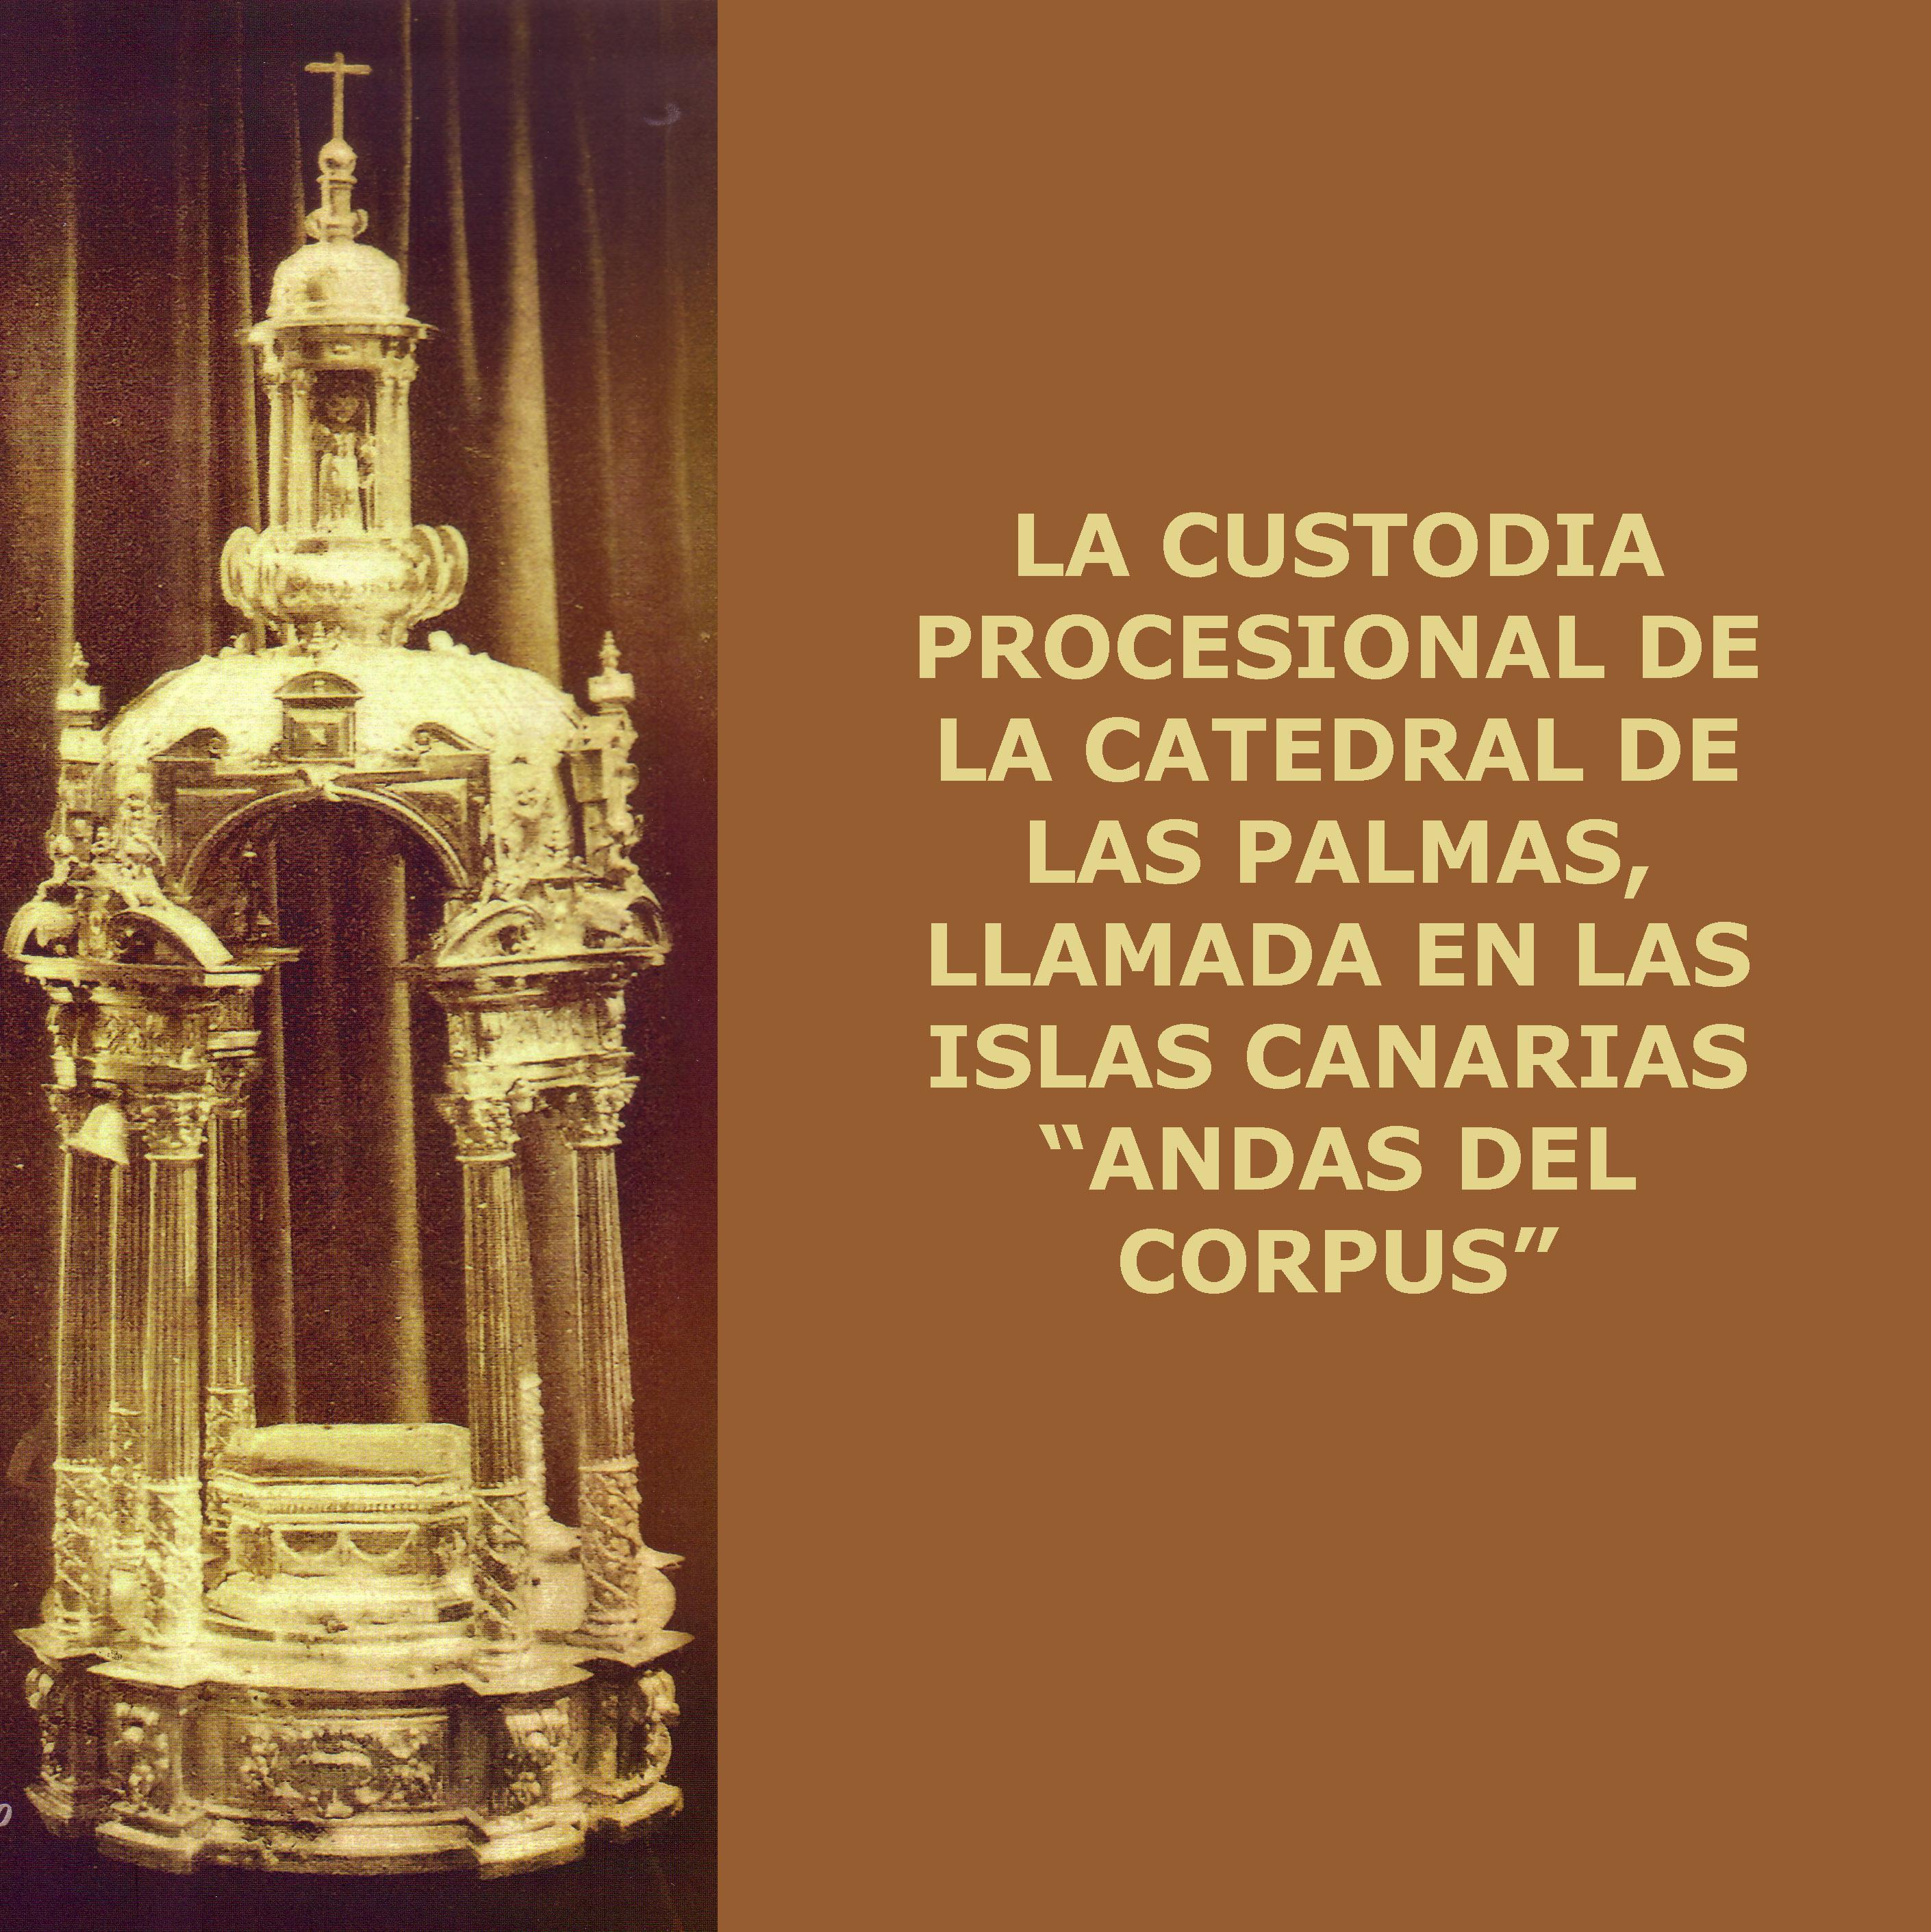 Custodia_titulo